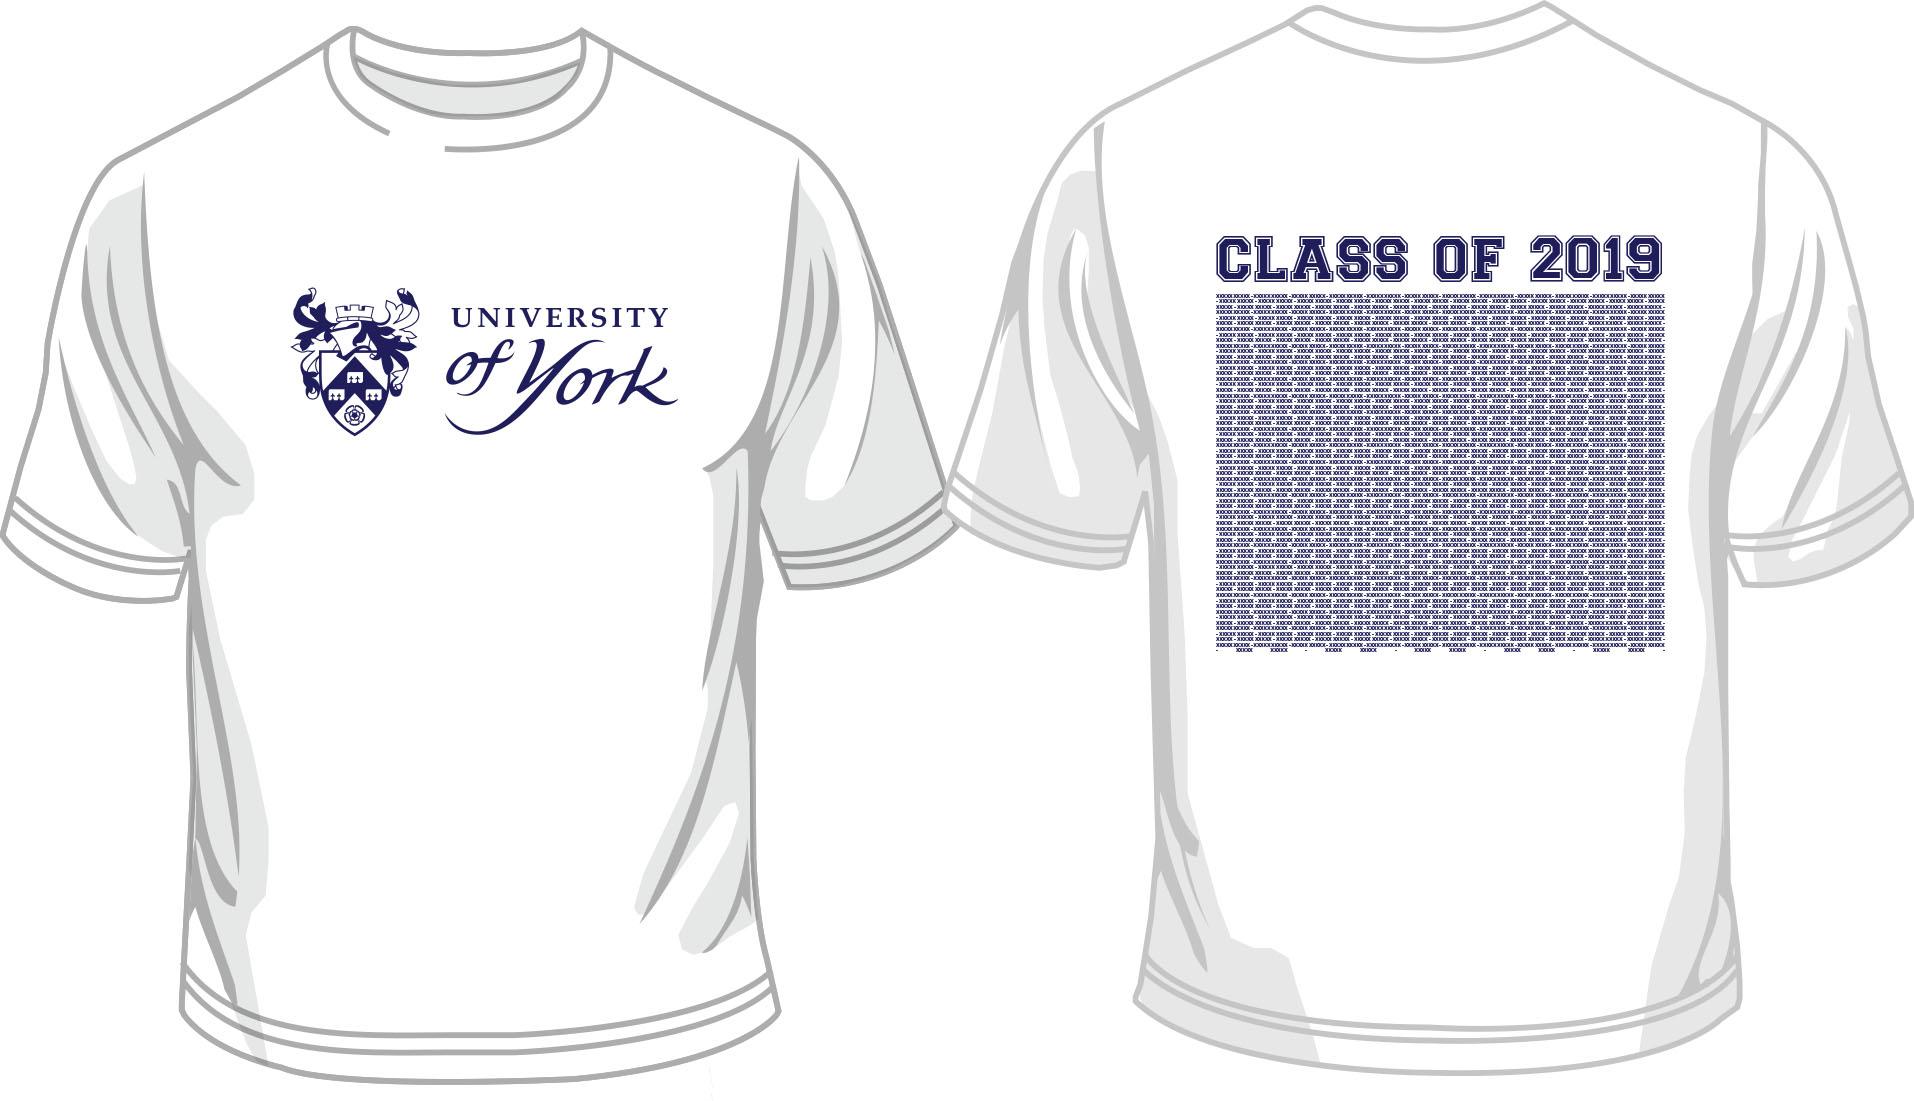 Graduation T-Shirt Wednesday 17th (White)